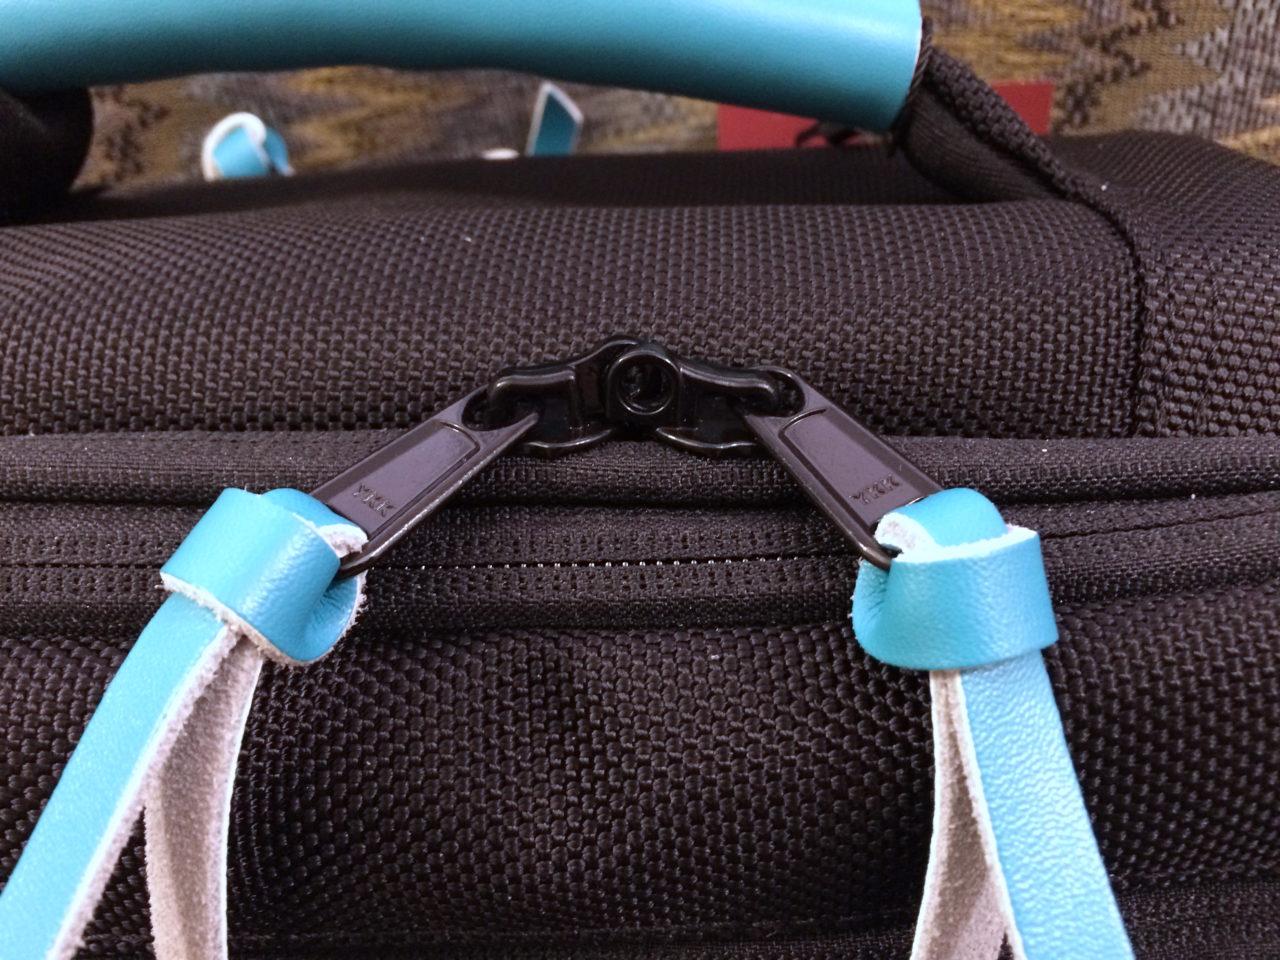 Standard Luggage locking zippers